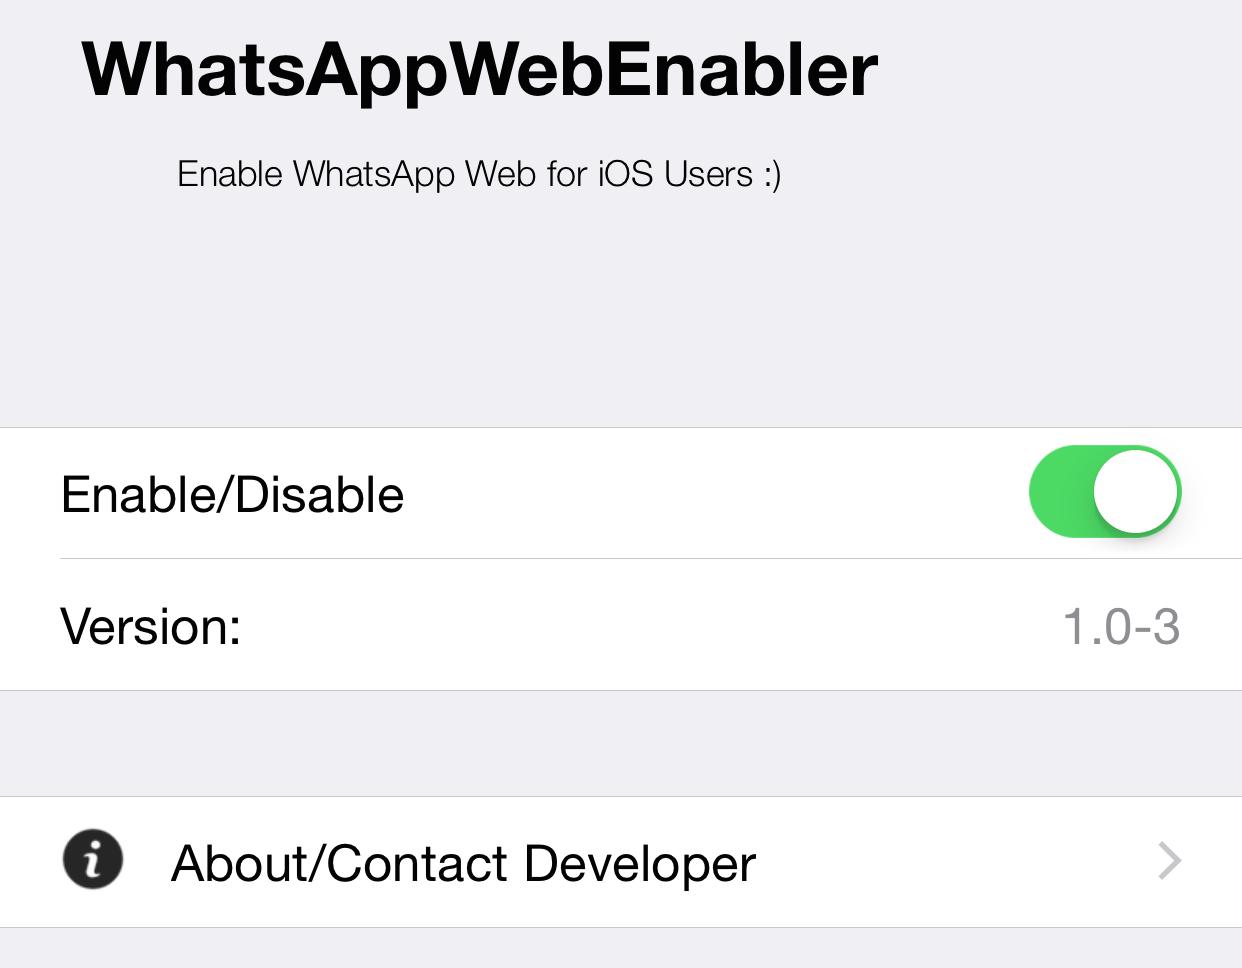 WhatsAppWebEnabler